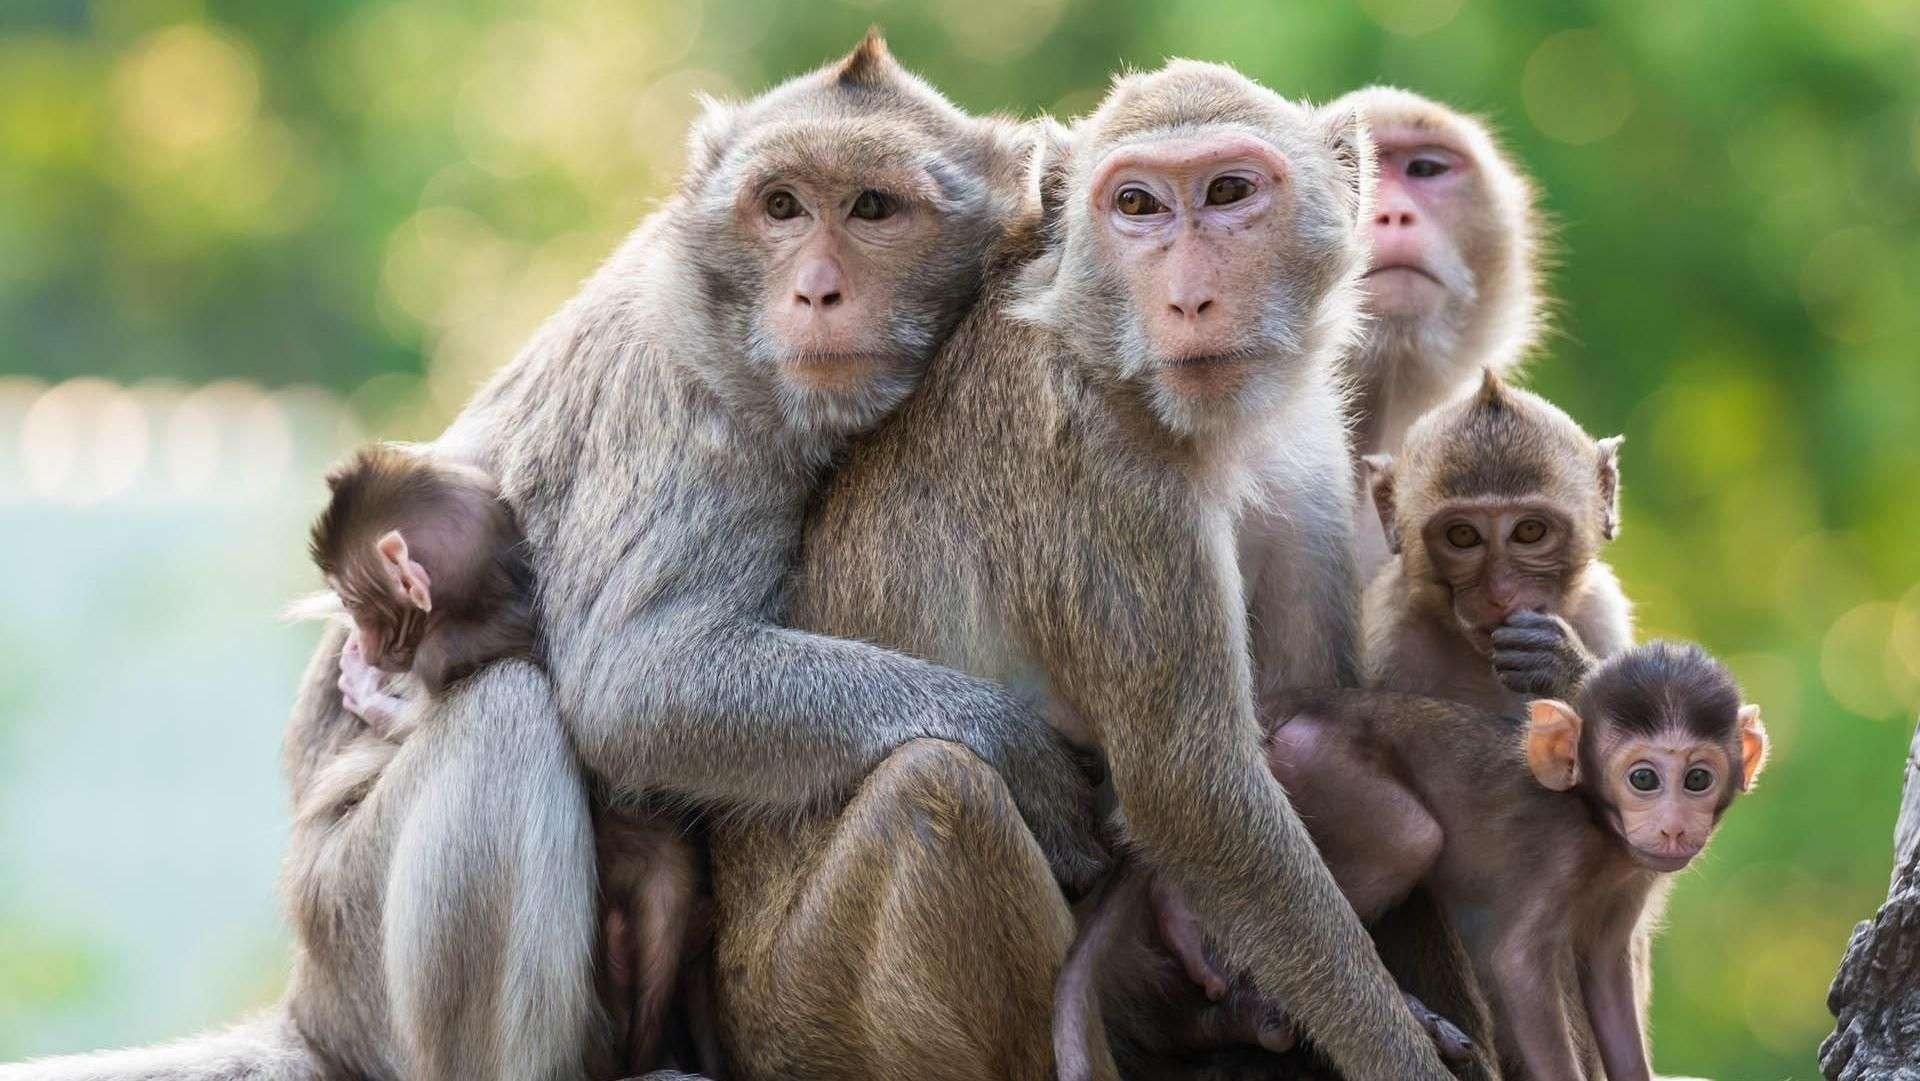 Macacos contra o autismo